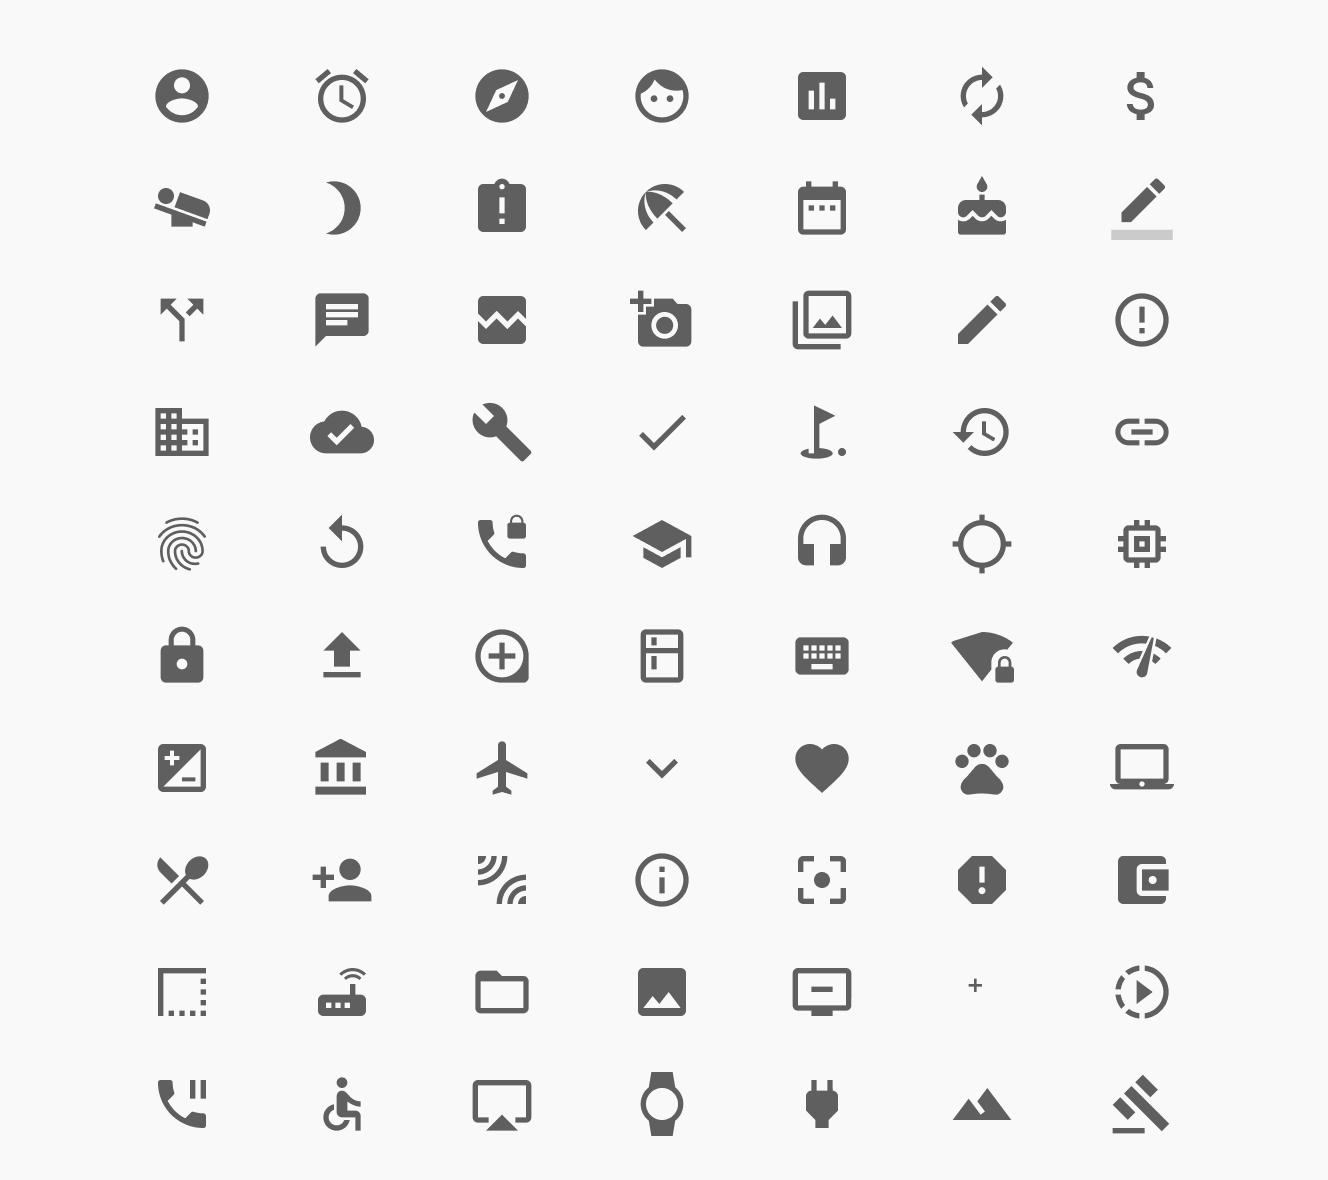 Google UI系统图标集 .sketch & .svg素材下载 图标-第1张